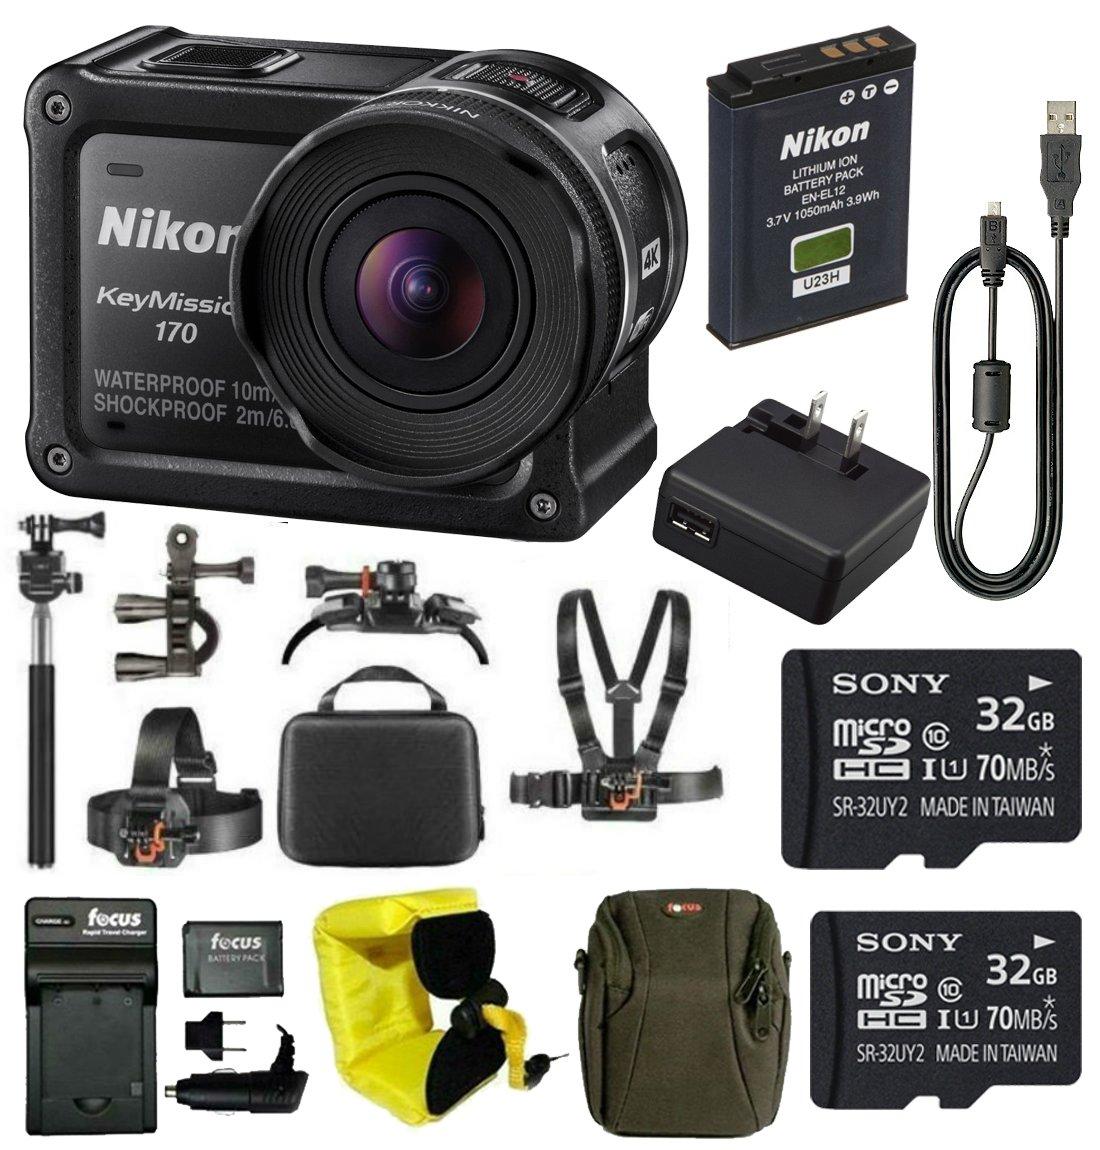 Nikon Keymission 170 Wi-Fi 4K Action Camera with 64GB Kit and Adventure Bundle